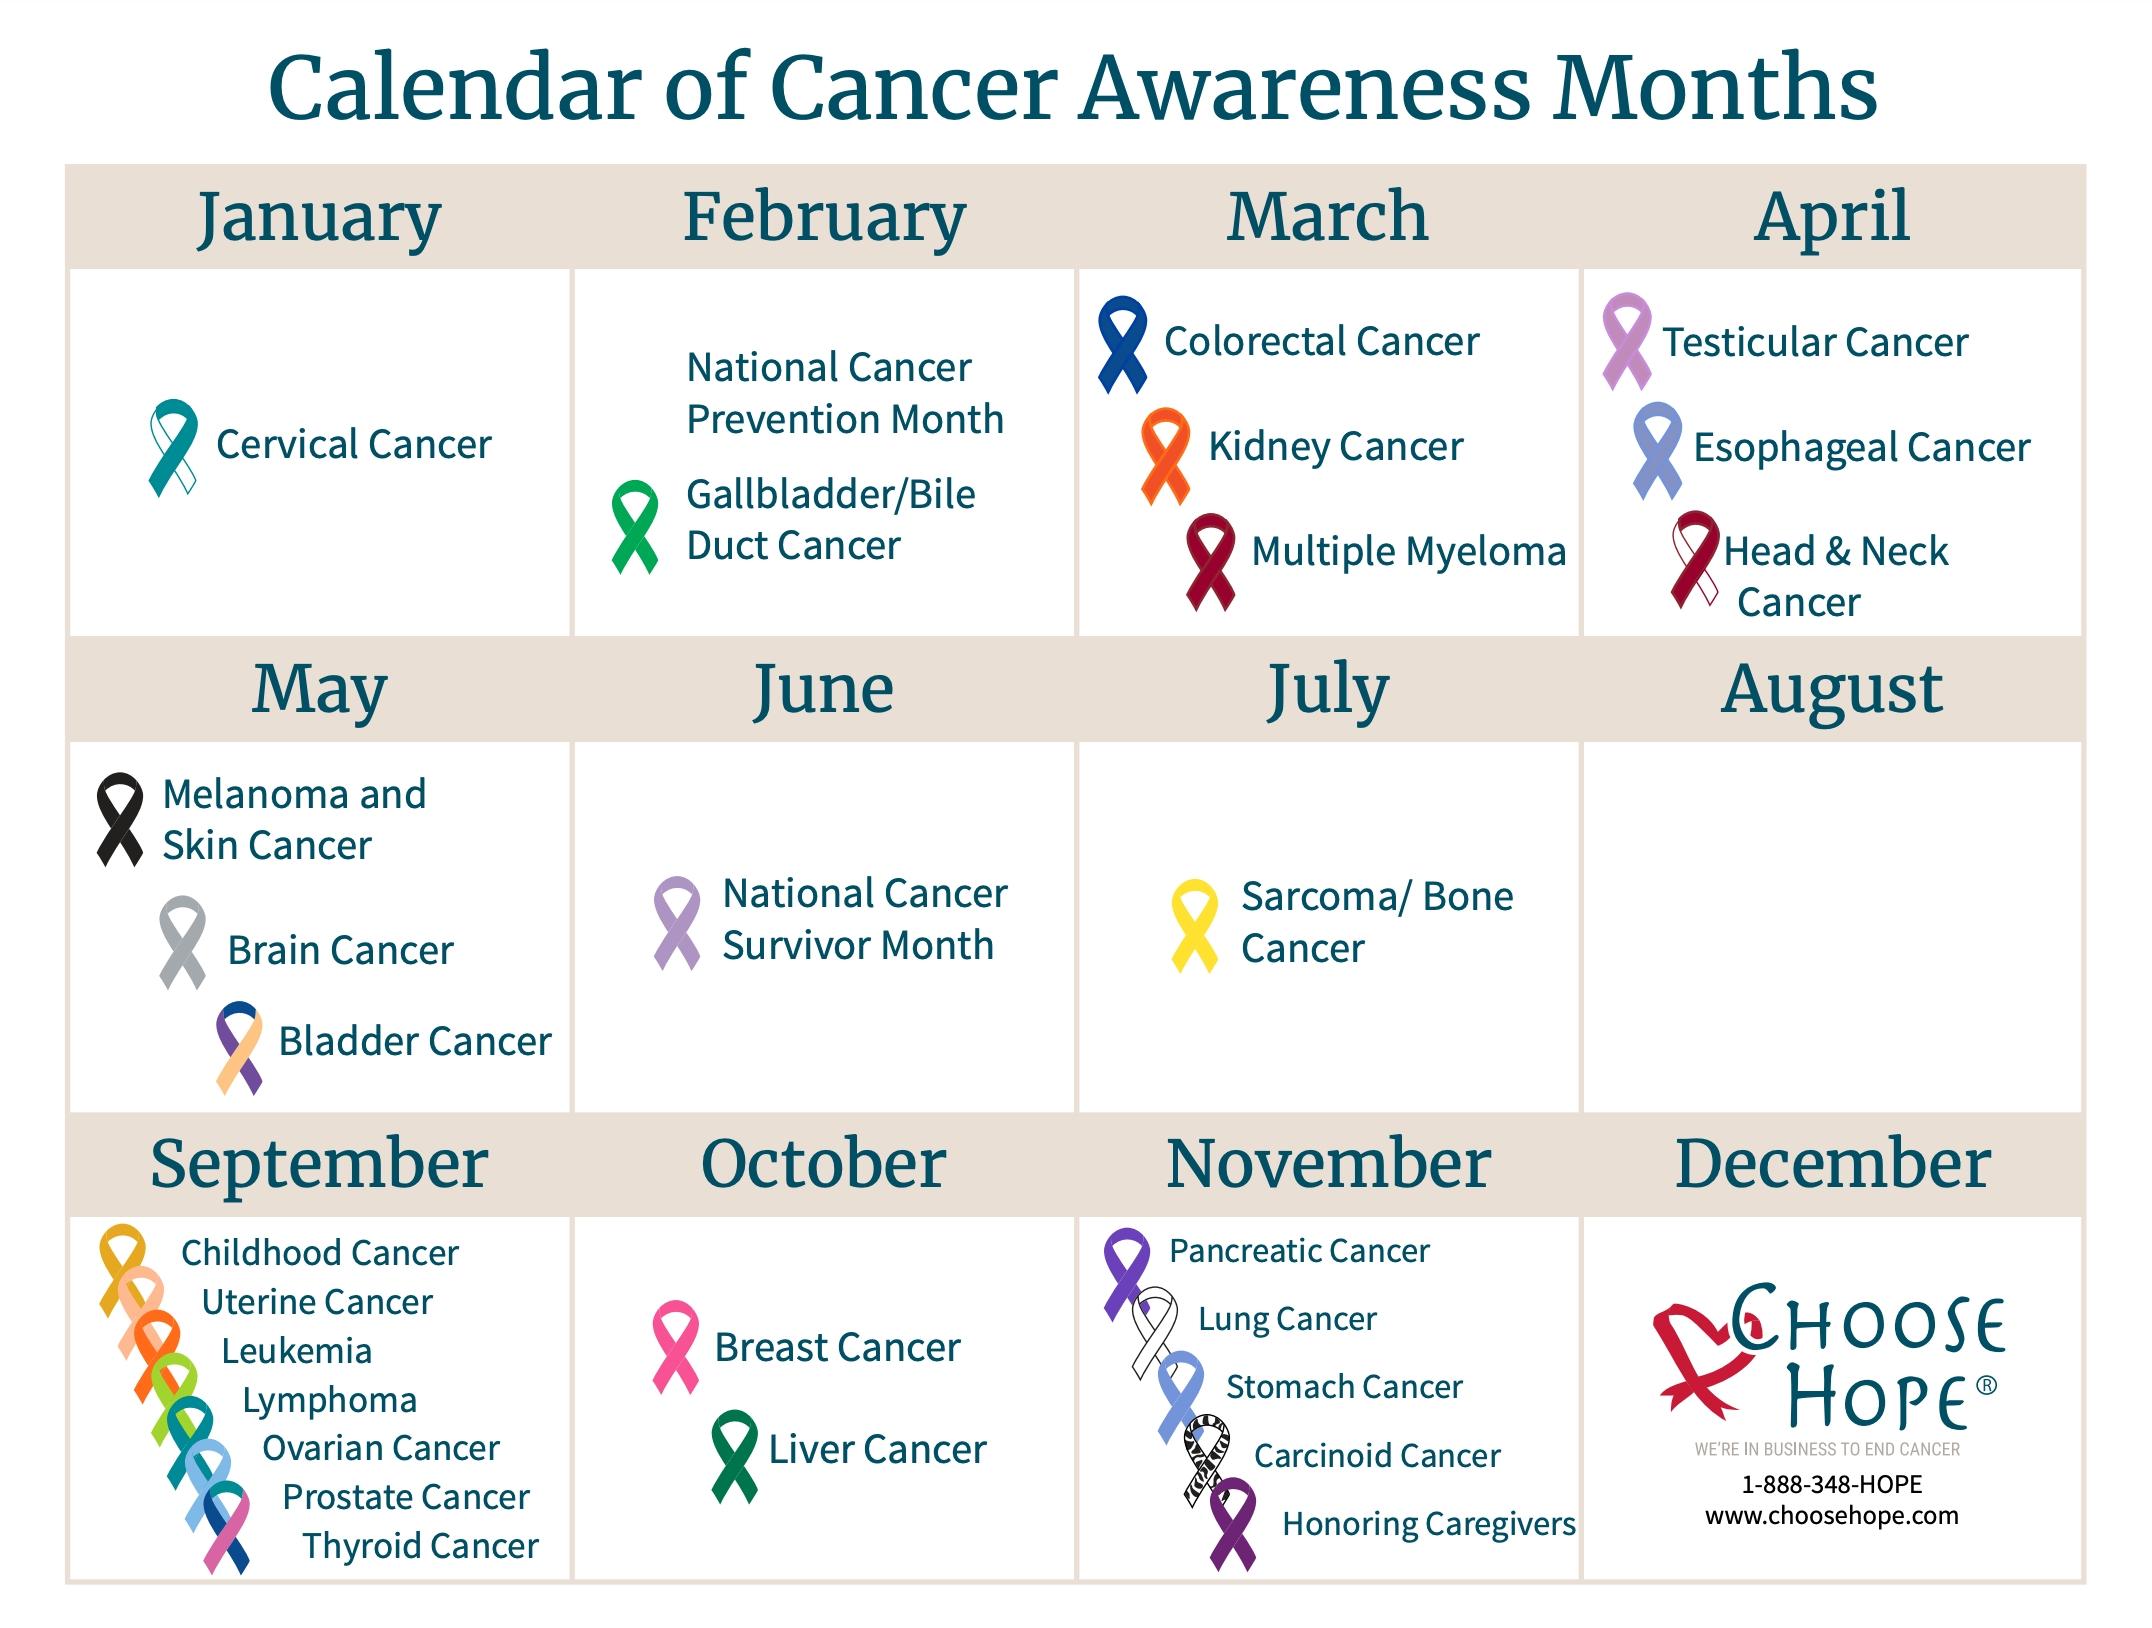 Cancer Awareness Months Calendar And Ribbon Colors   Choose Hope National Awareness Calendar For 2021